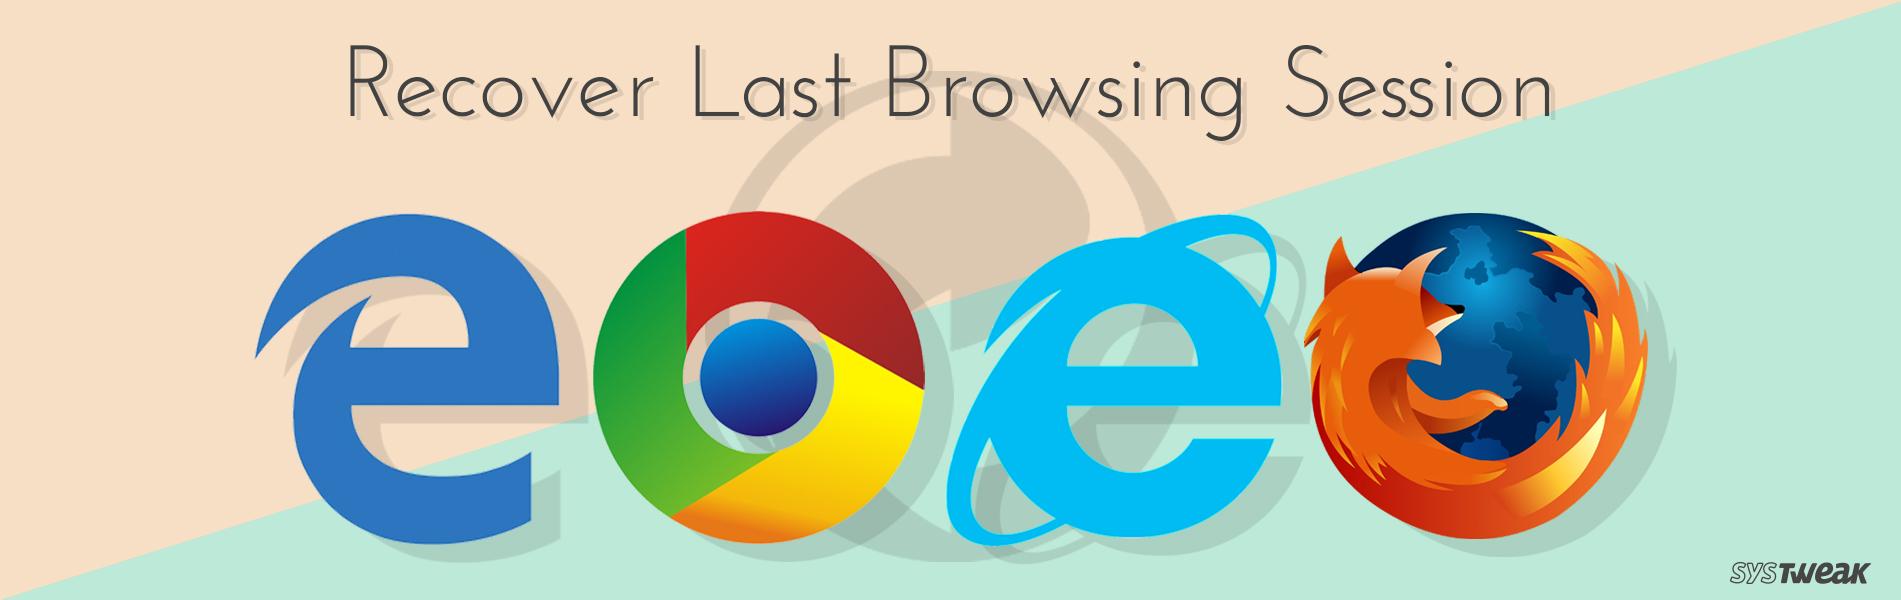 How to Restore Last Session in Chrome, Firefox, Edge, Internet Explorer